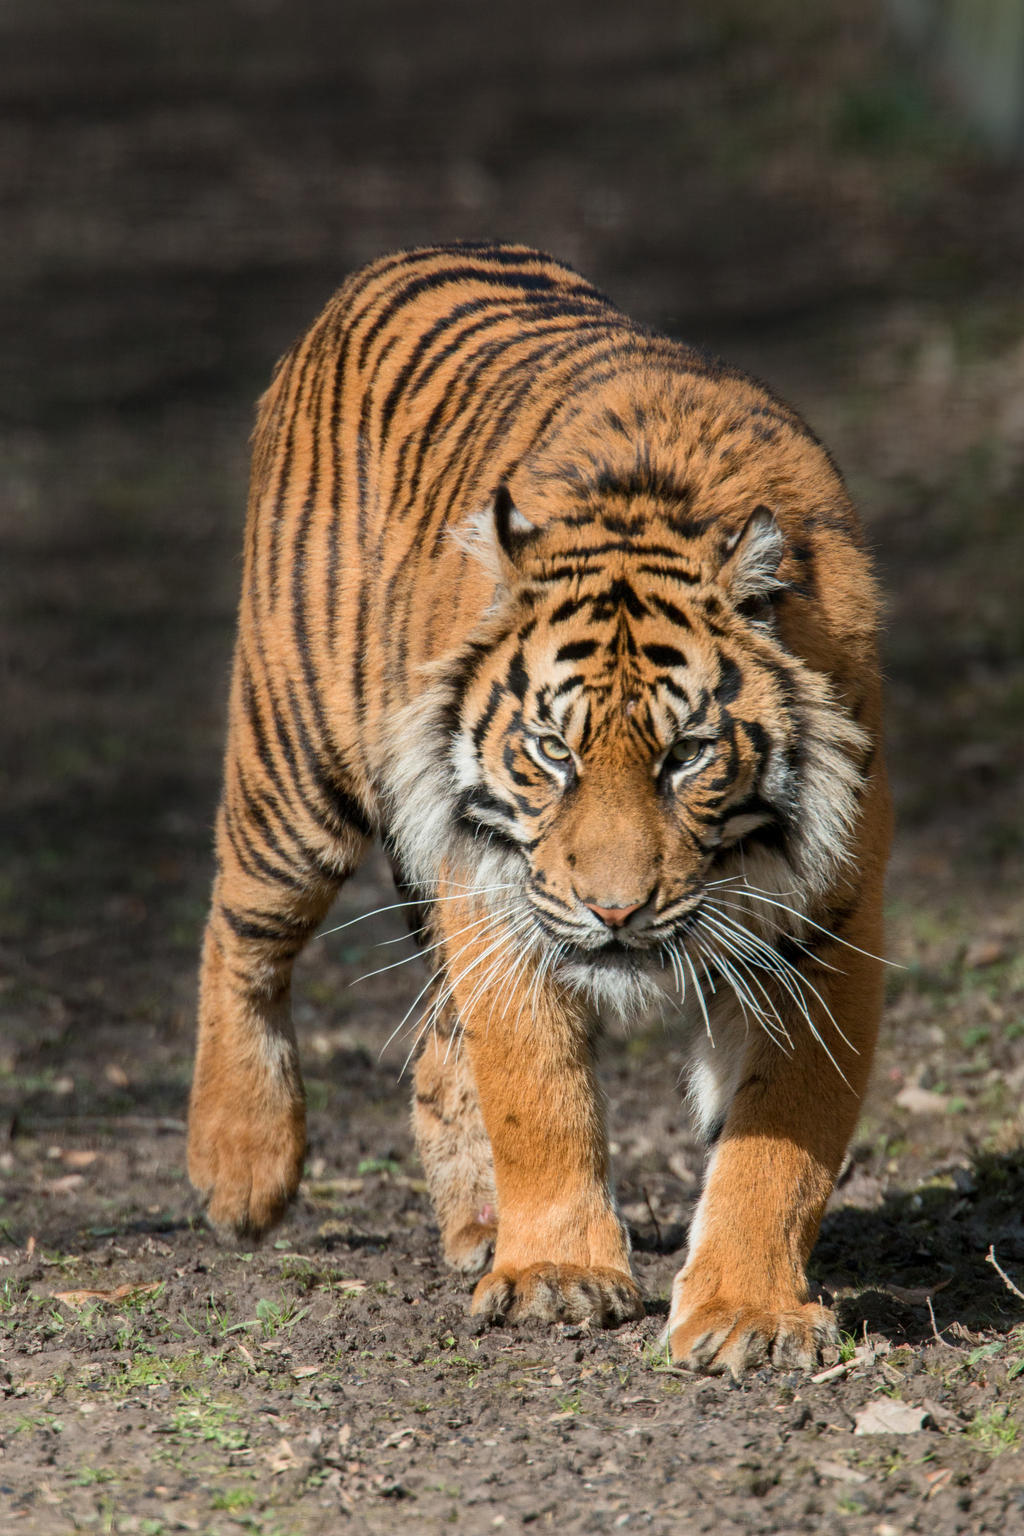 stock] [hi-res] tiger #2seb-photos on deviantart